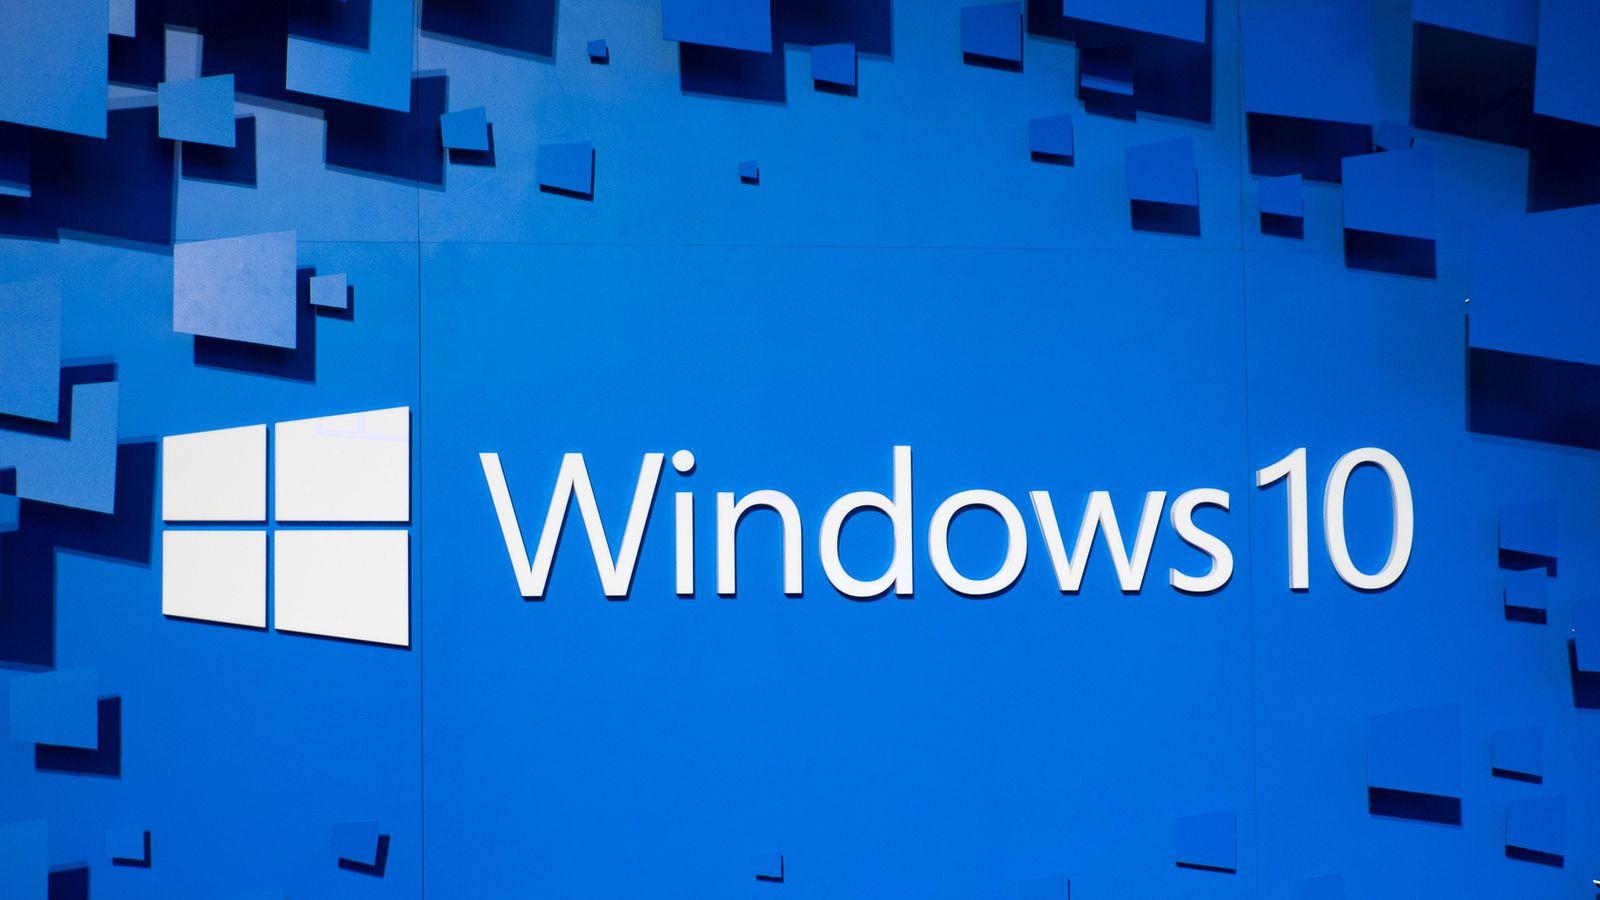 Animated Wallpaper For Laptop Windows 7 The Best Hidden Features In Windows 10 S Major Update